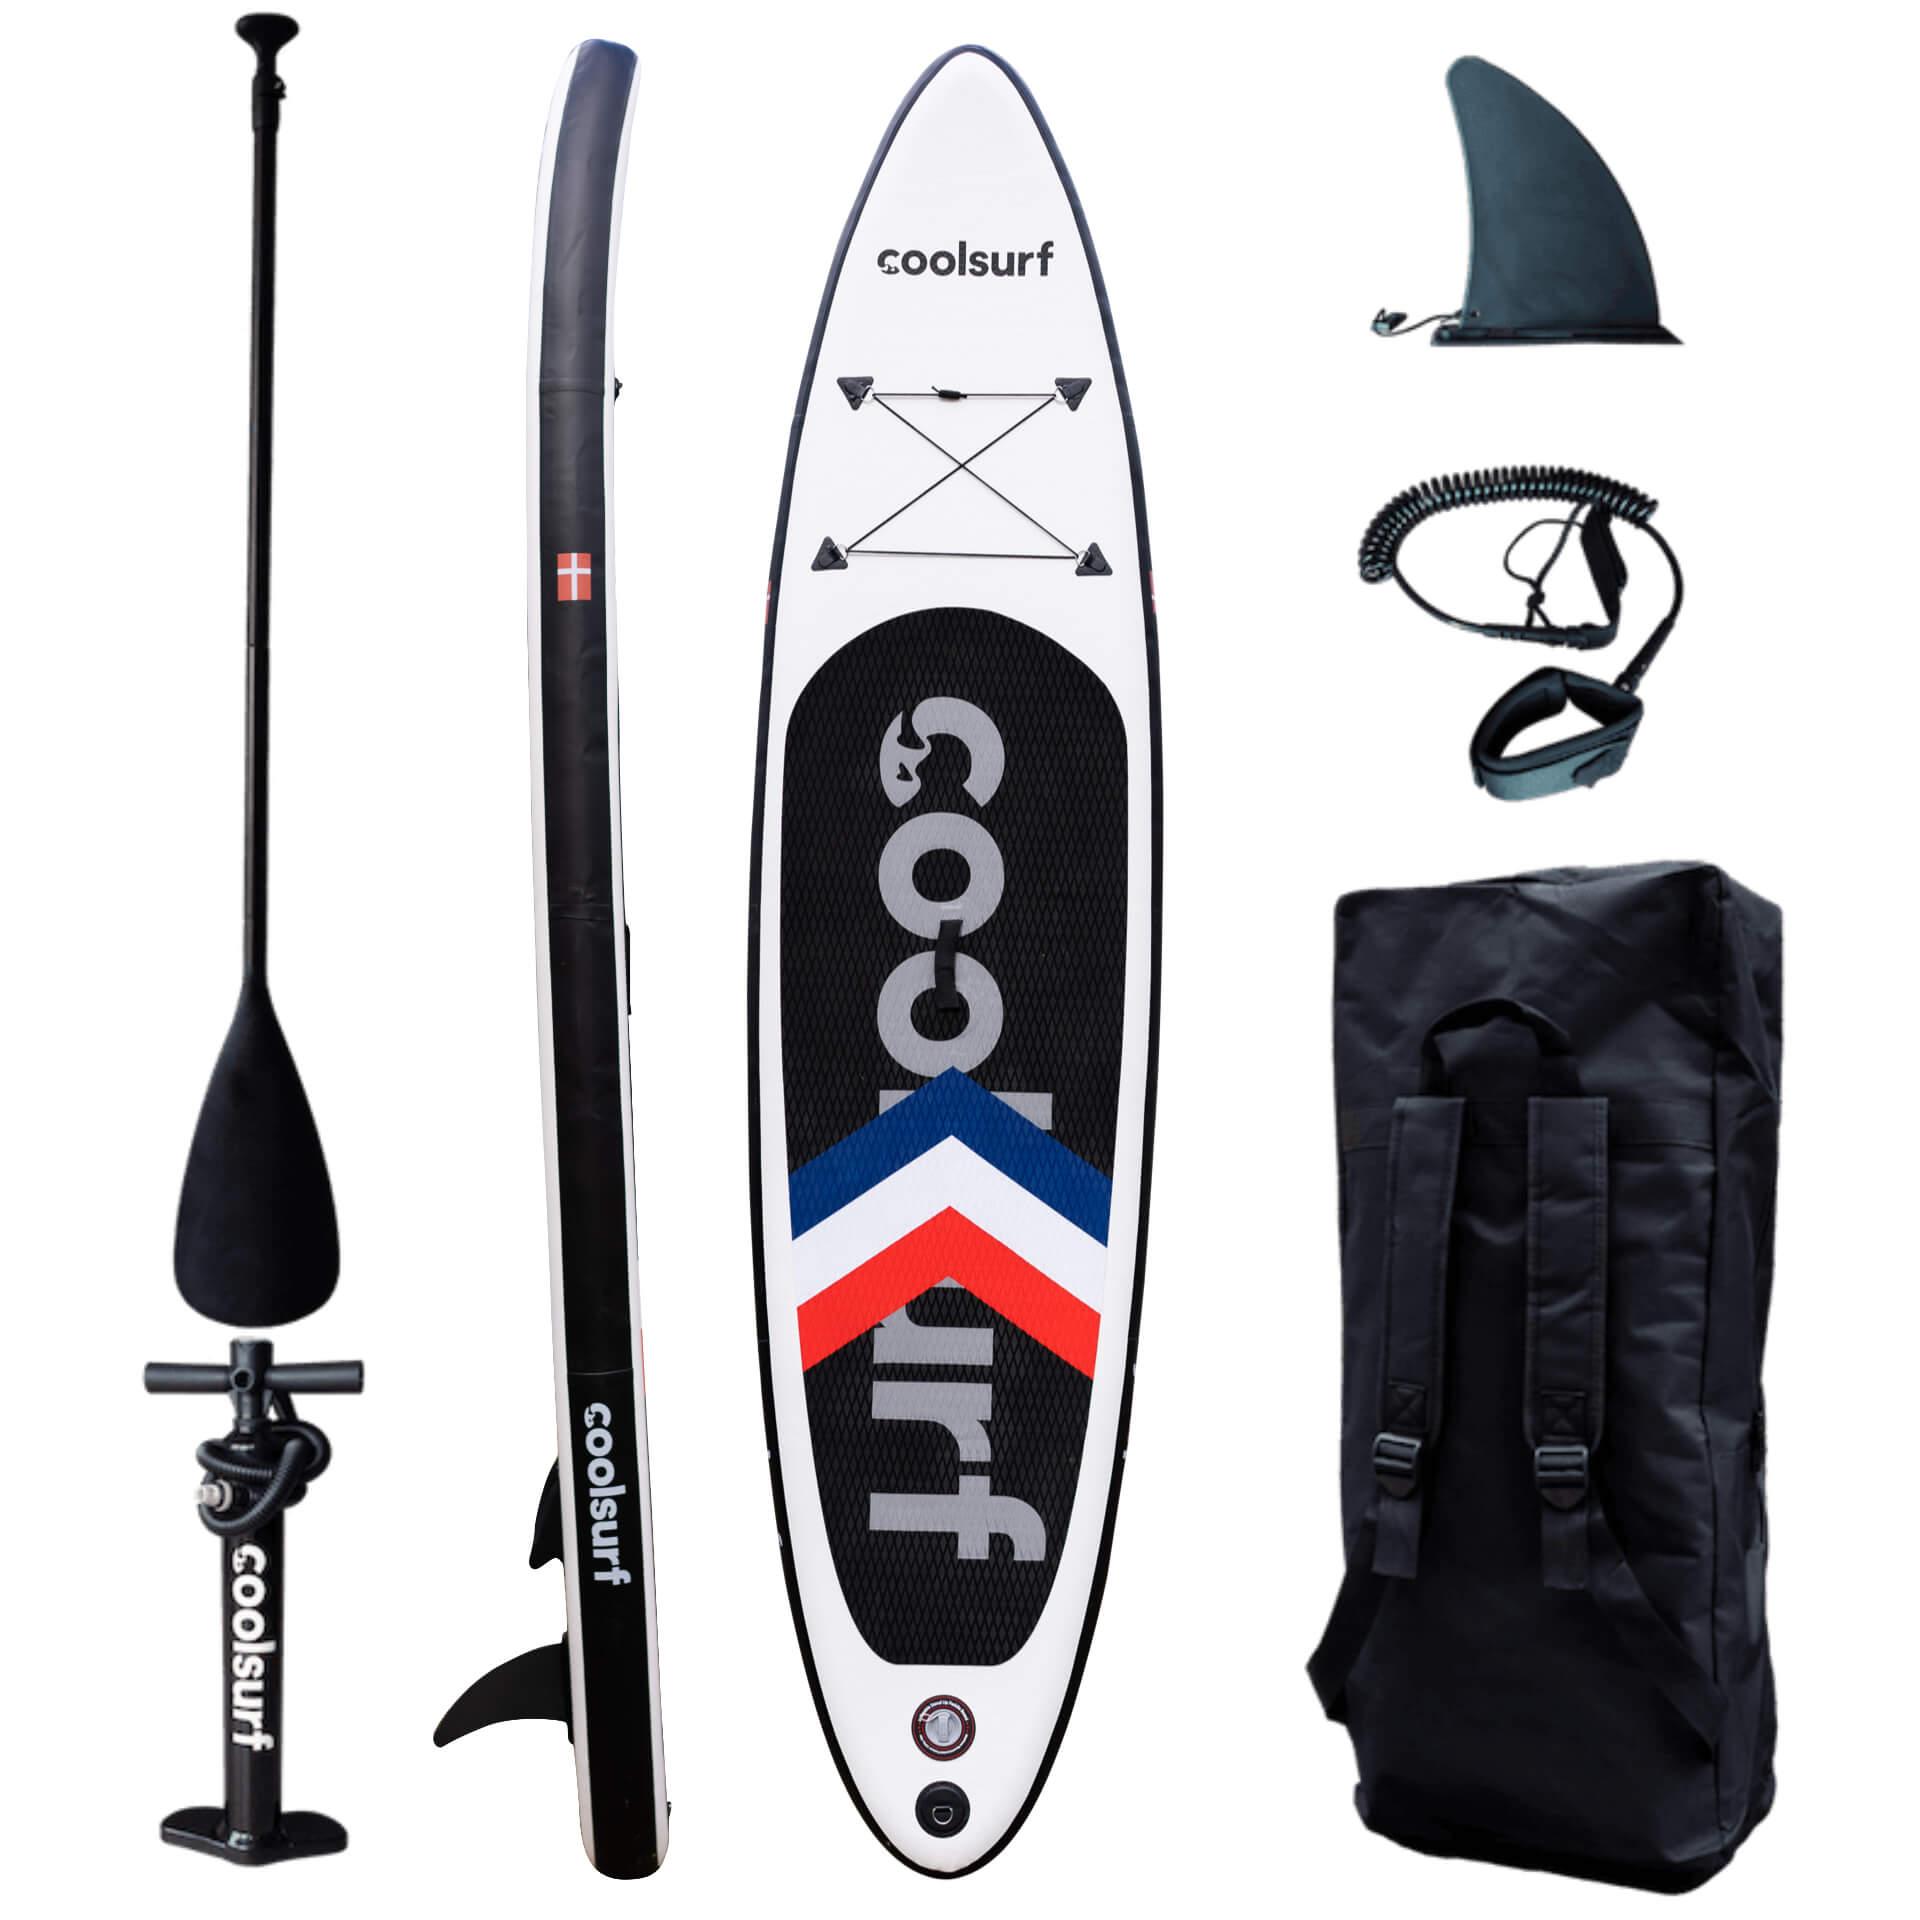 CoolSurf LYON Kite Paddleboard - SUP Gonfiabile 3,35M